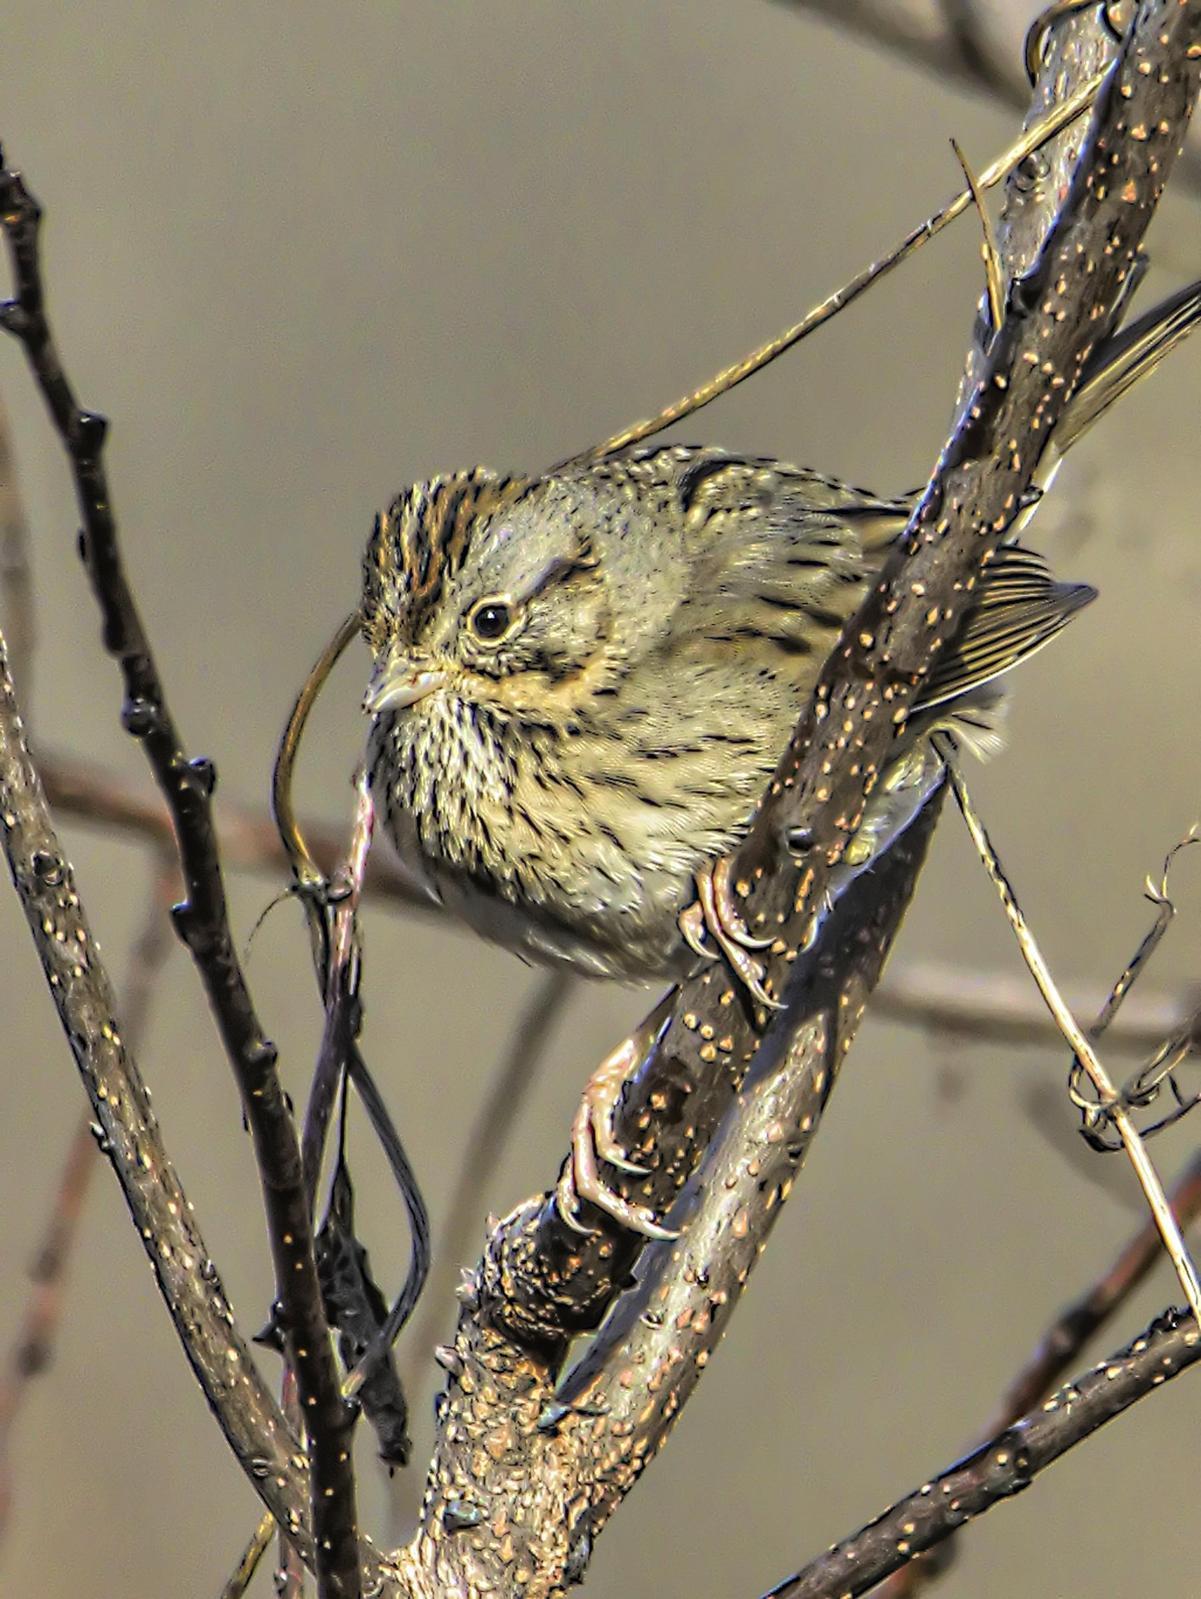 Lincoln's Sparrow Photo by Dan Tallman